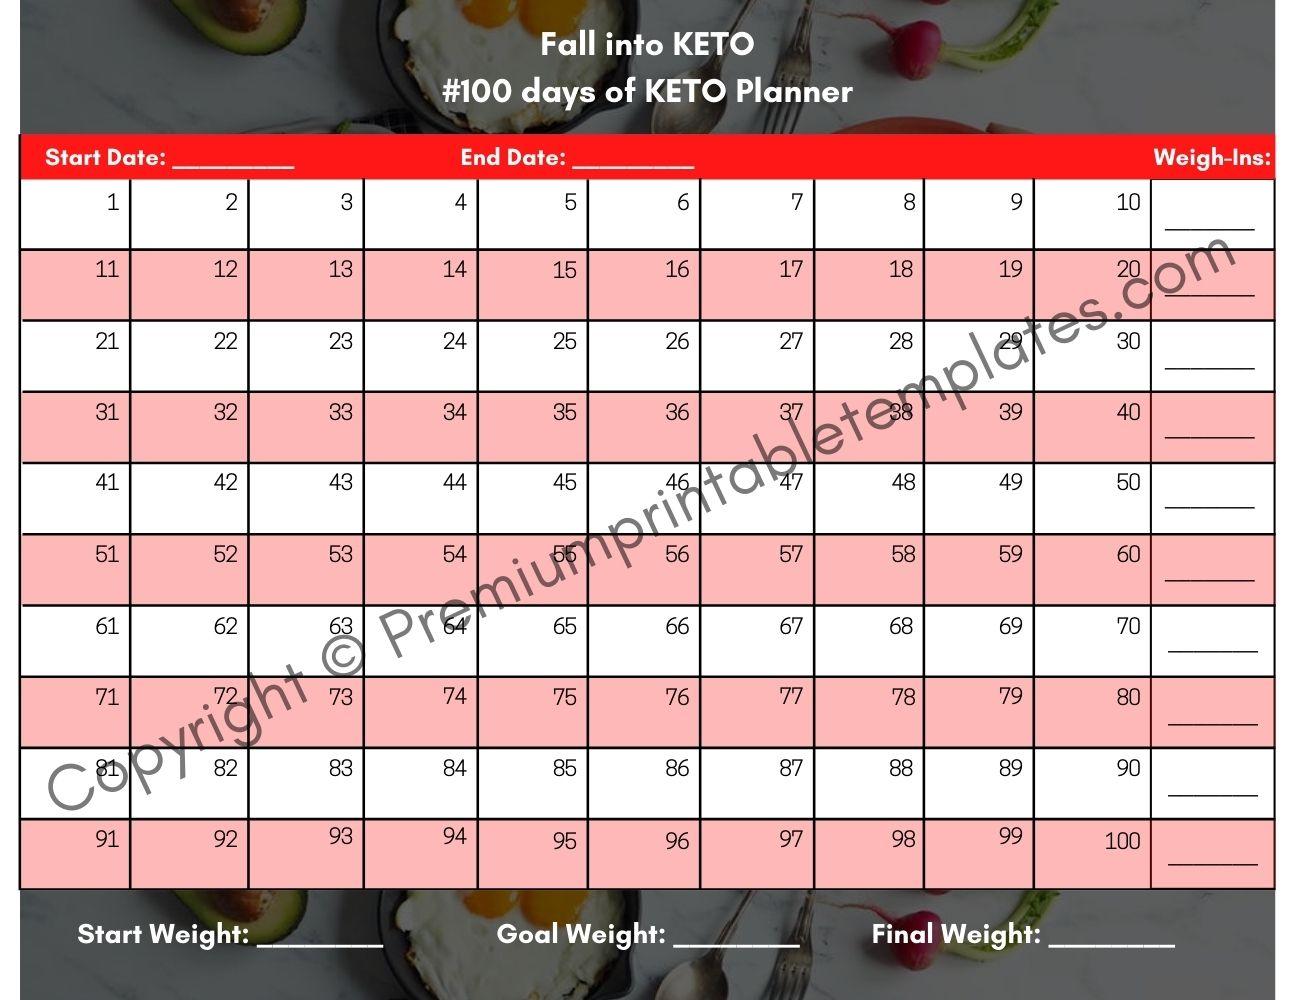 Printable Fall Keto Tracker, 100 Days Of Keto Planner in 100 Days Of Keto Calendar